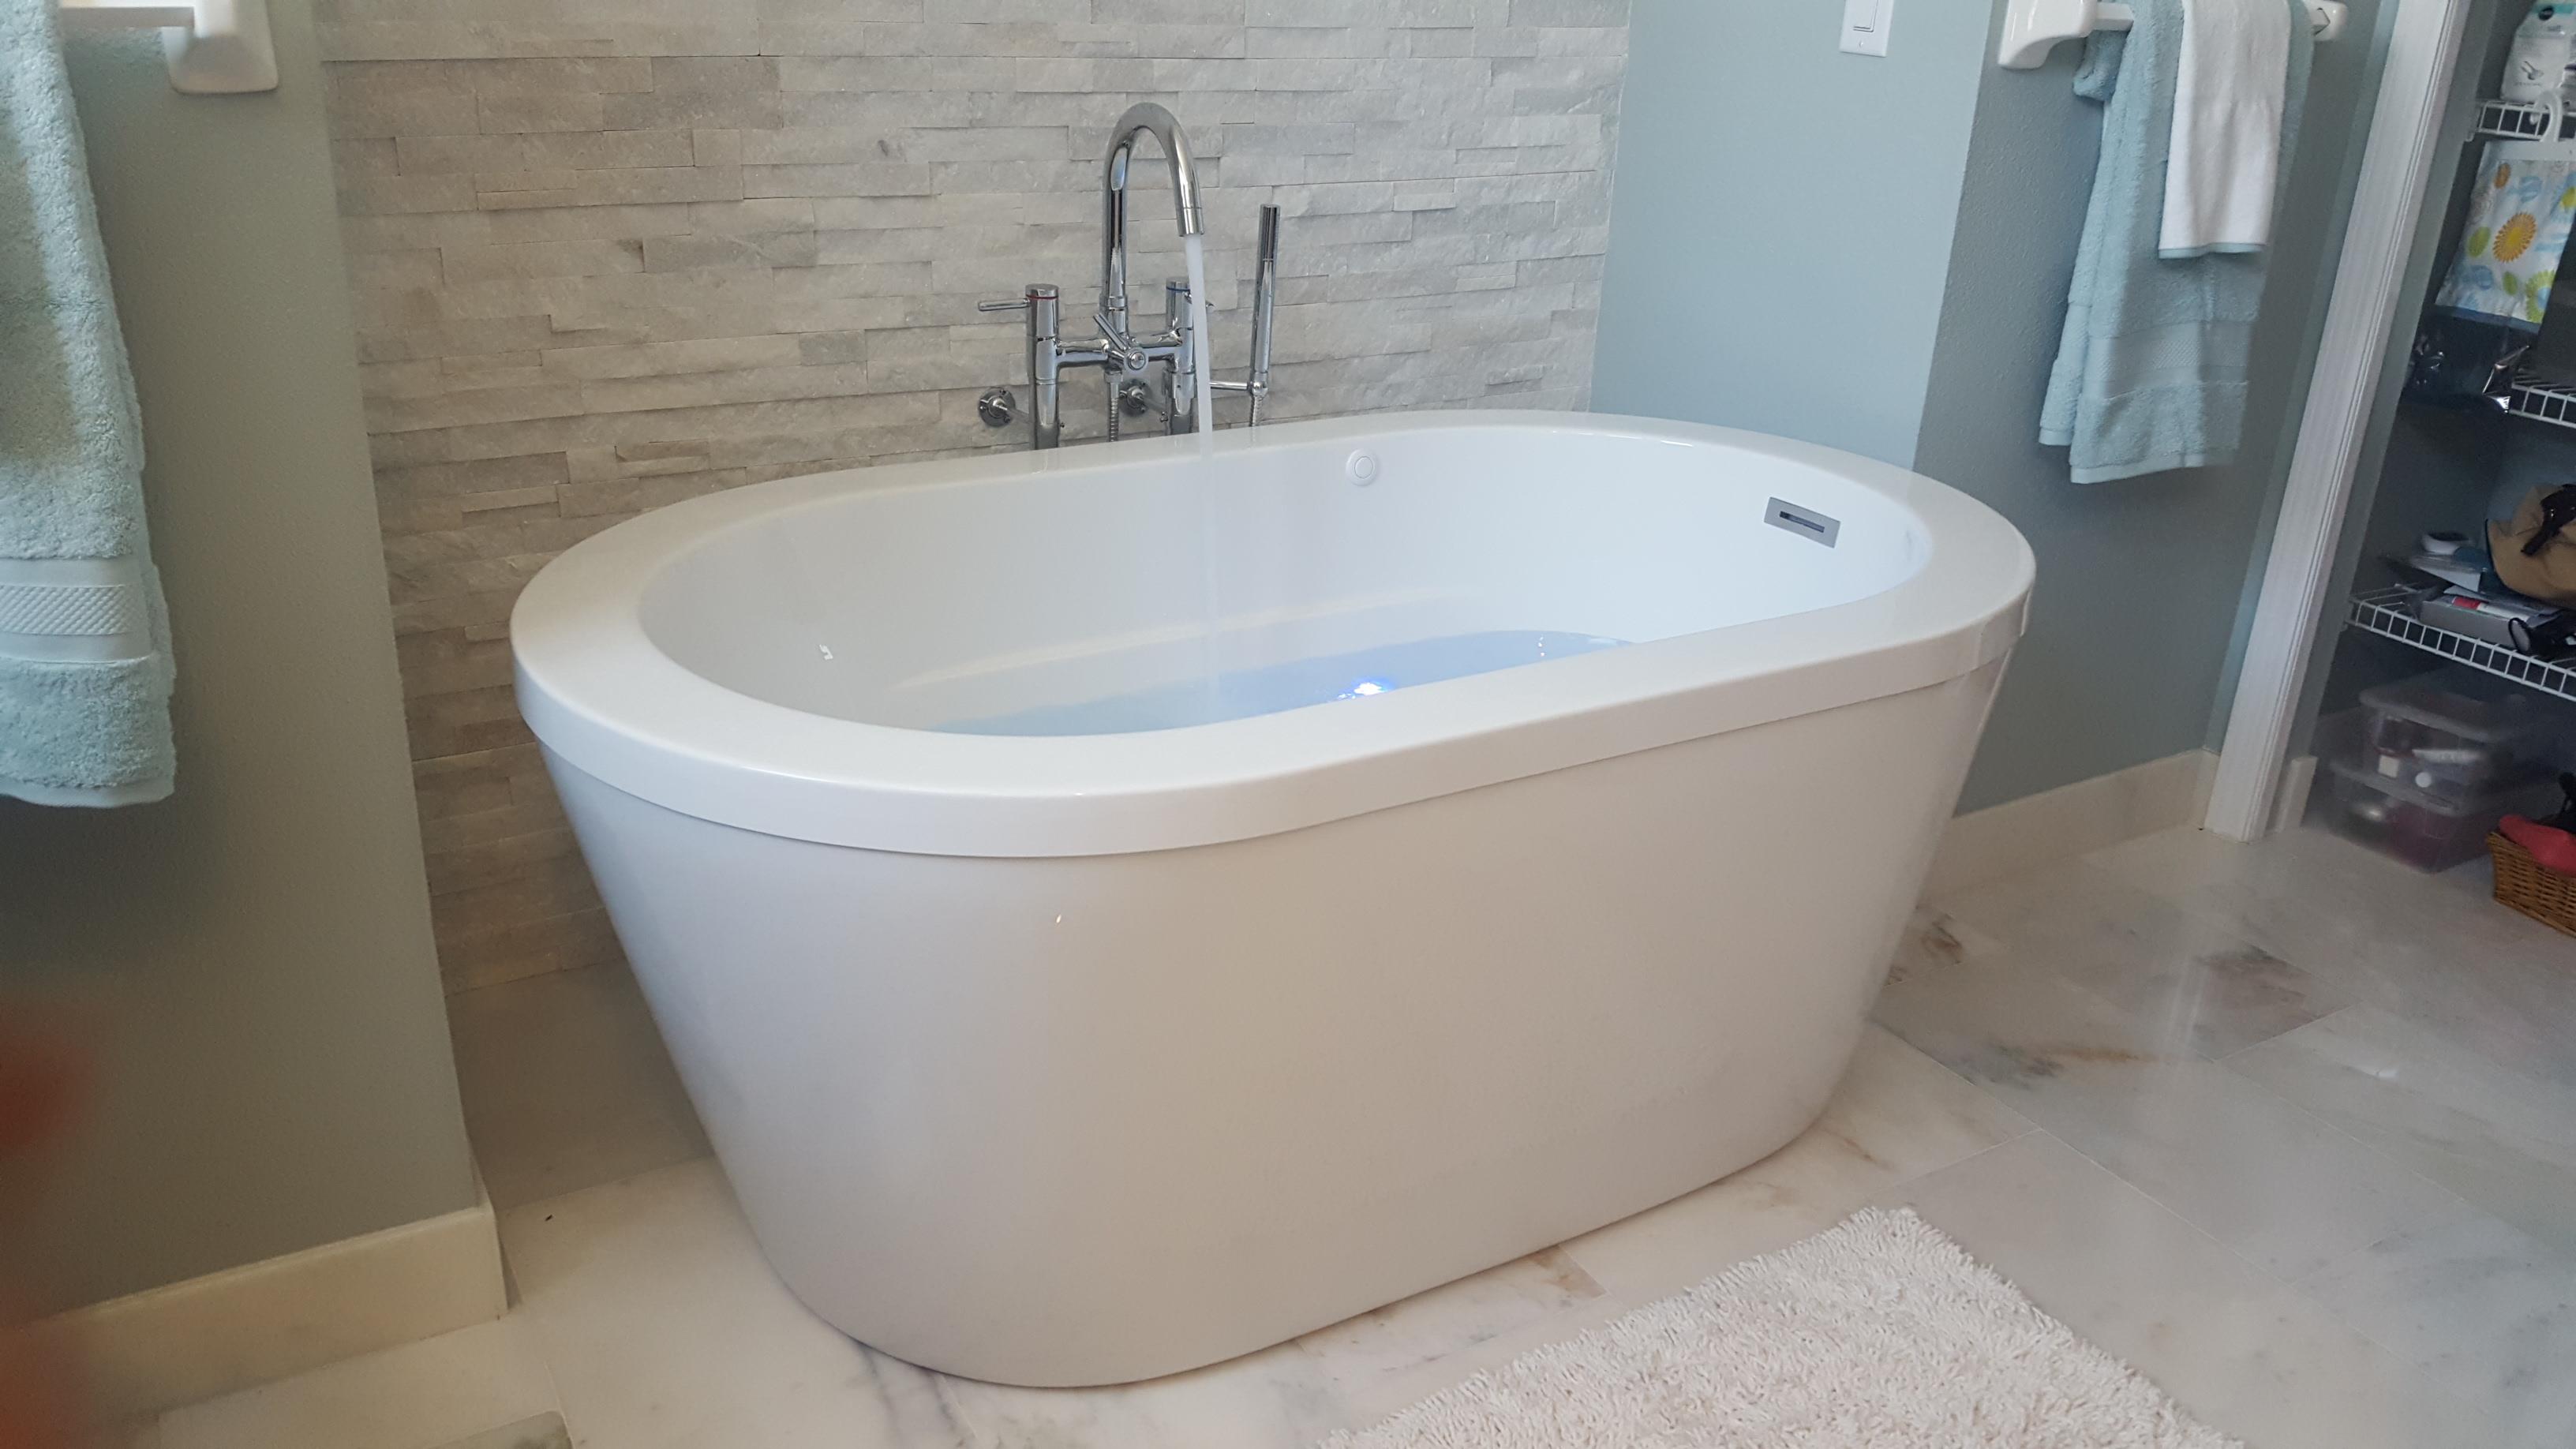 freestanding tub end drain. End Drain slipper Quality Freestanding